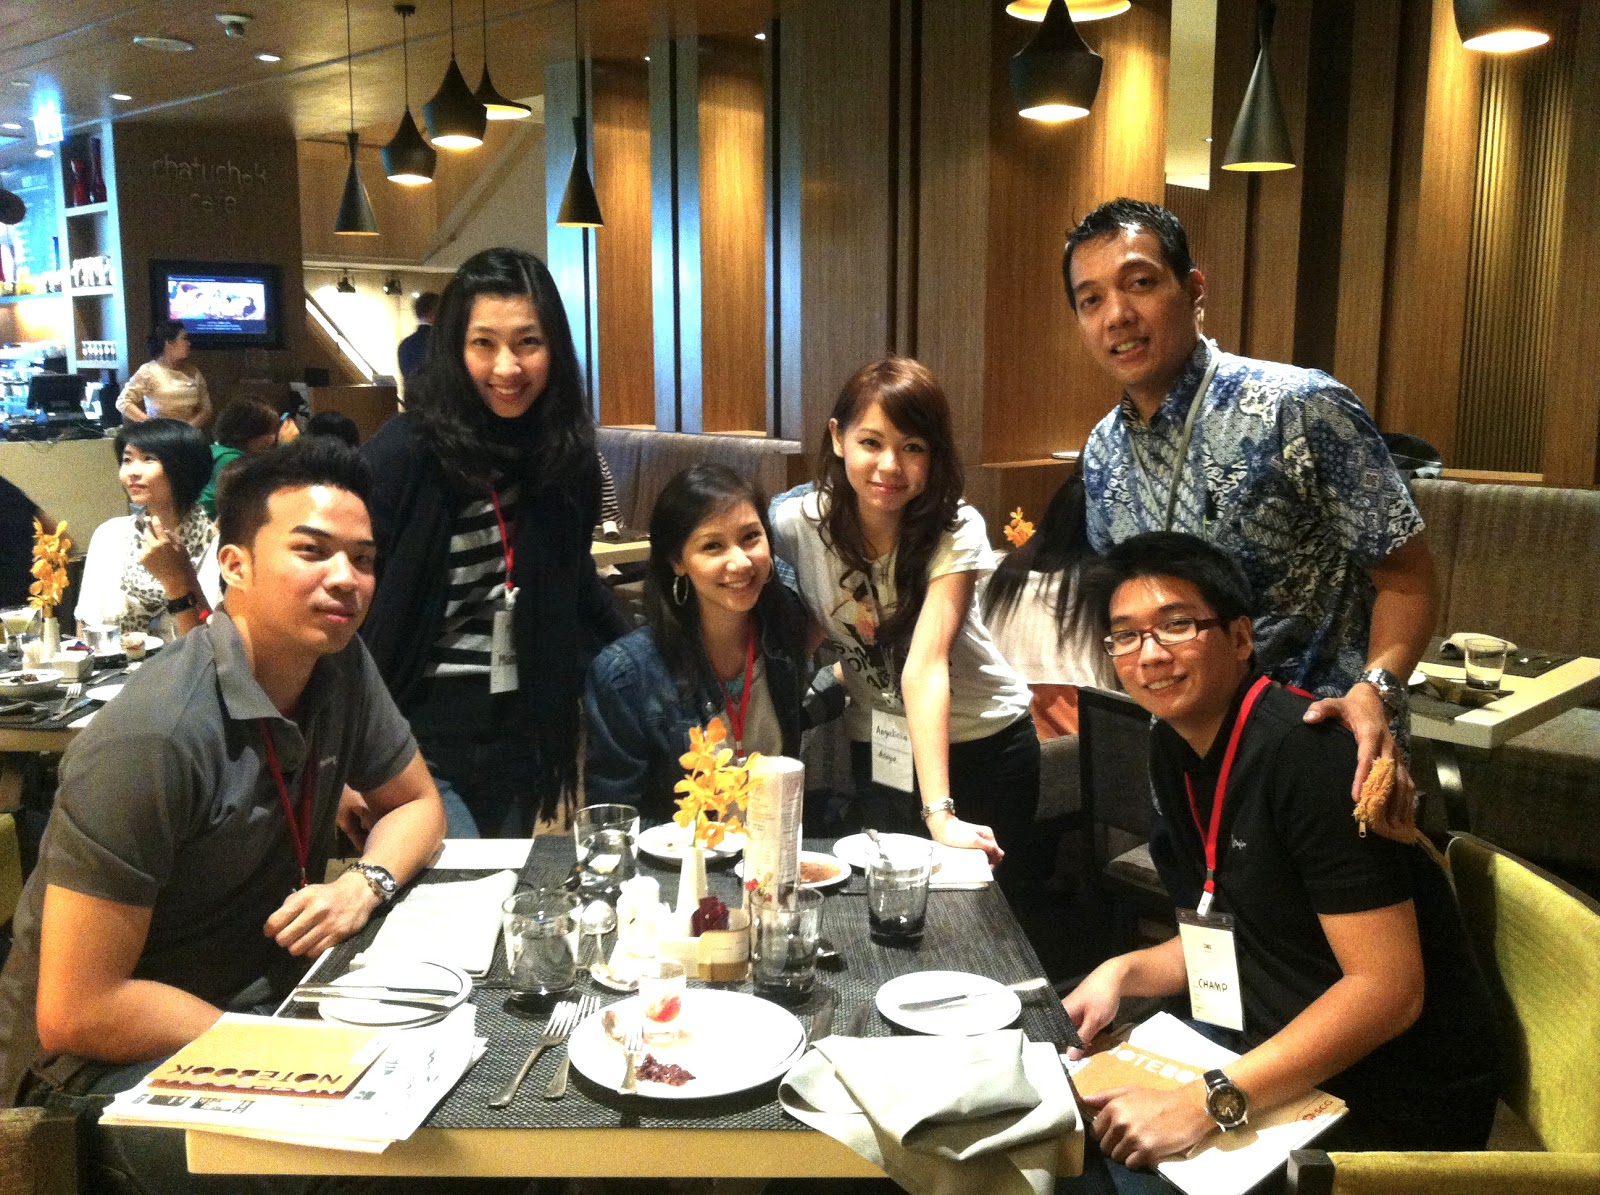 Ambassador Hotel Bangkok 48 (60) 42